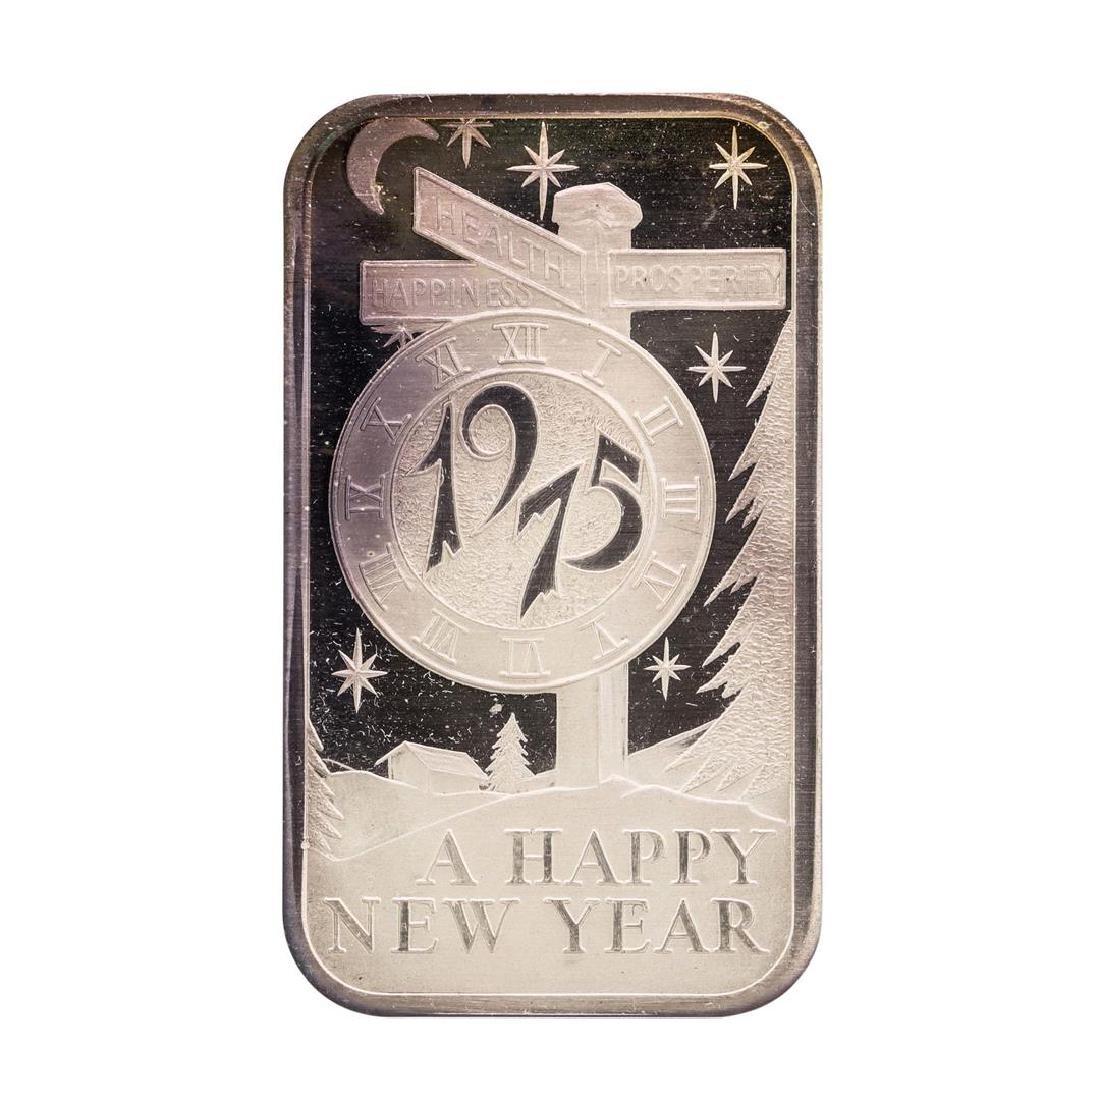 1975 Happy New Year Madison Mint 1 oz .999 Fine Silver